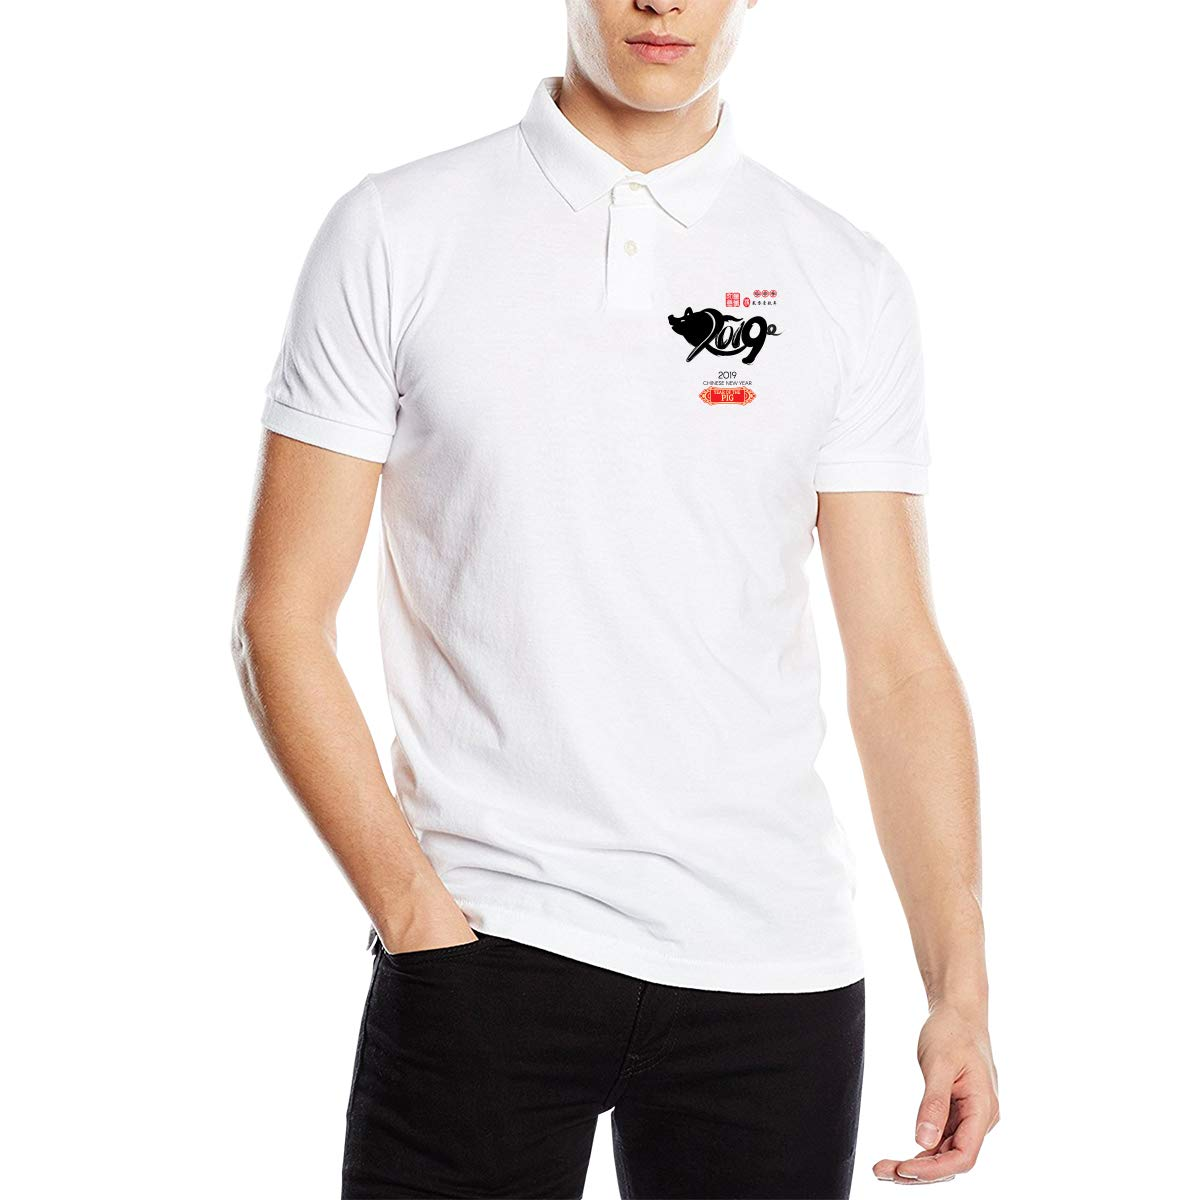 Jianju Mens Designed Breathable Chinese Calendar Short Sleeve Funny Polo T Shirts White